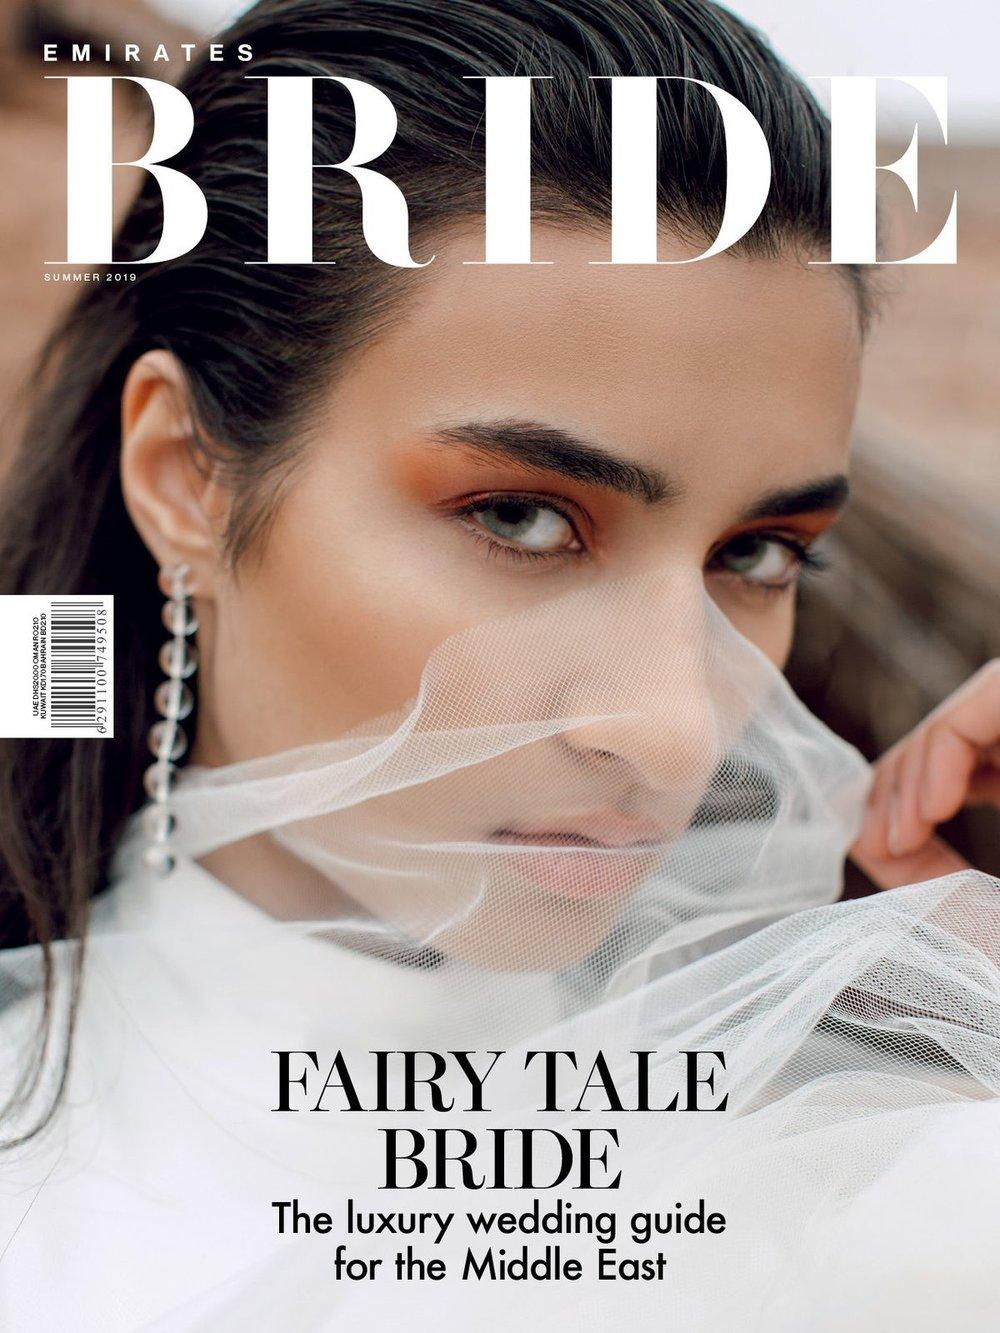 Emirates Woman Bride Cover